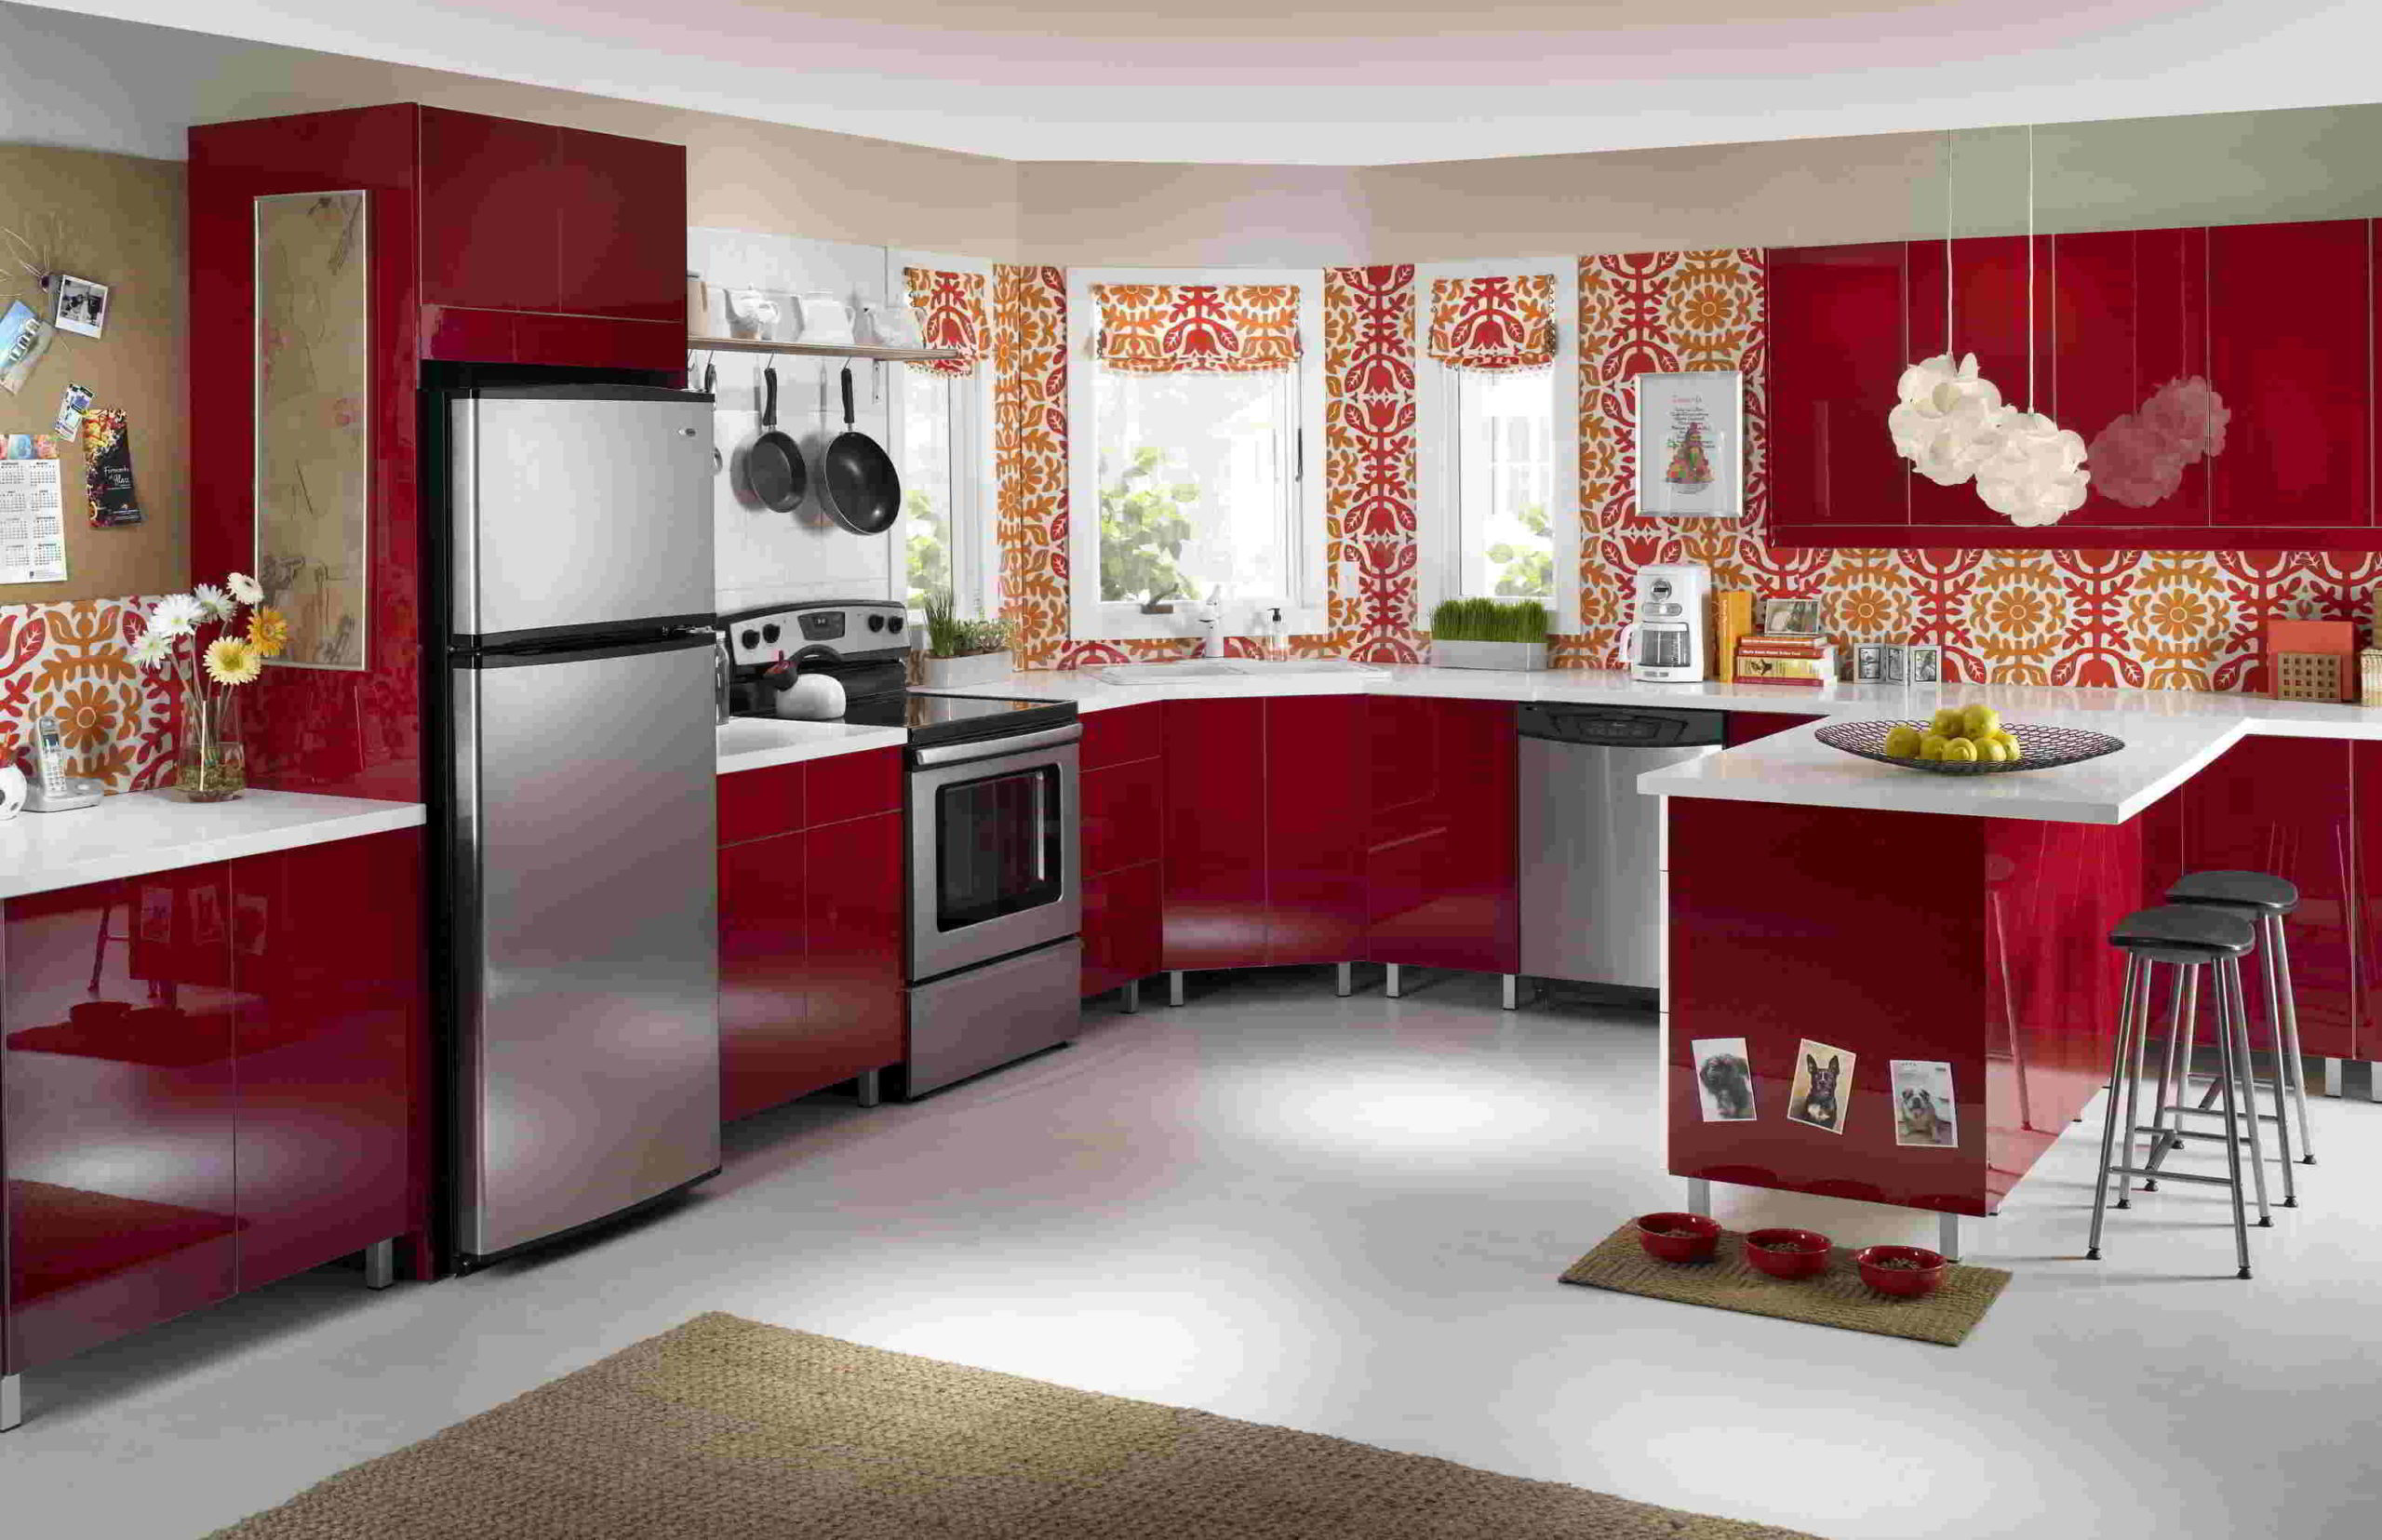 wallpaper for kitchens